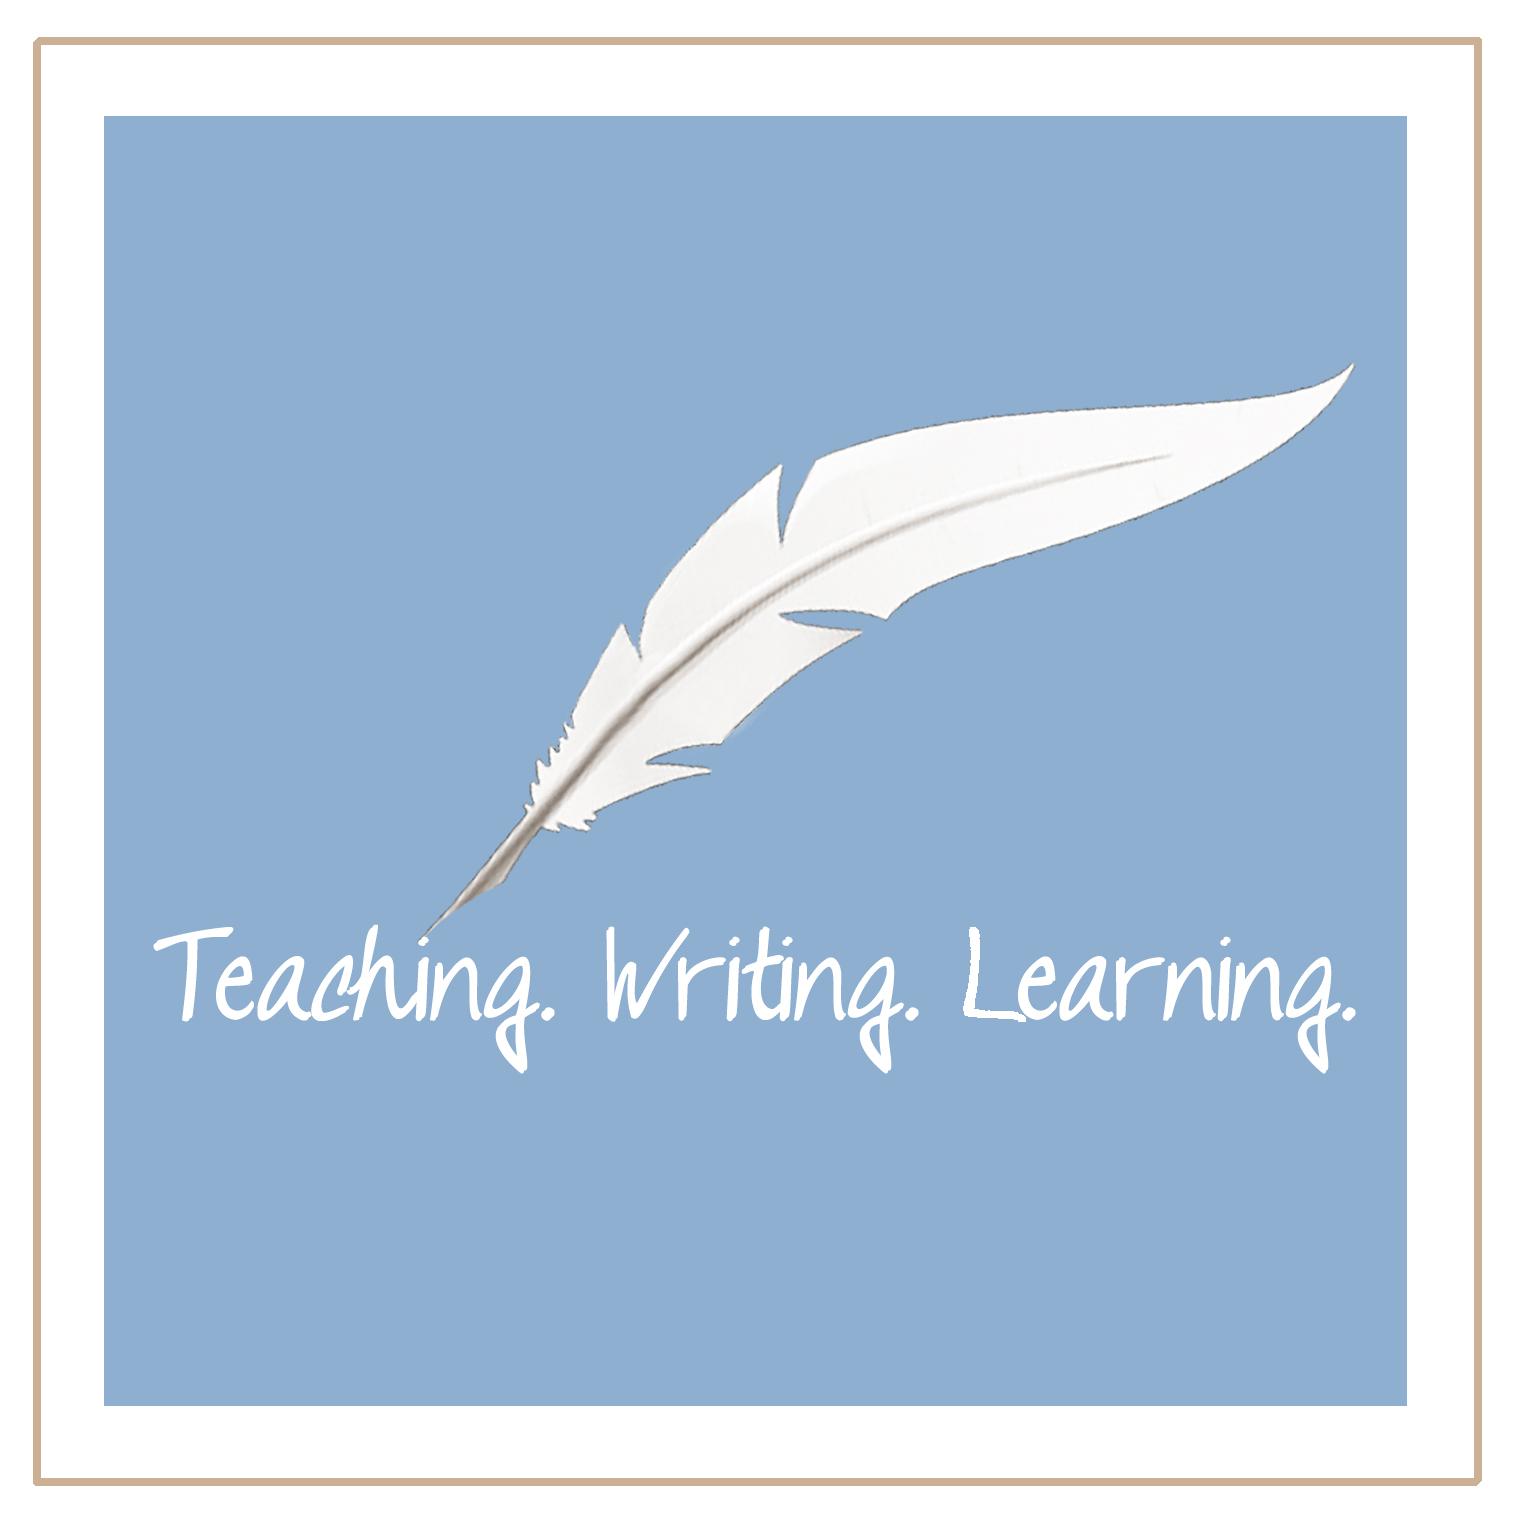 Teaching.Writing.Learning. logo